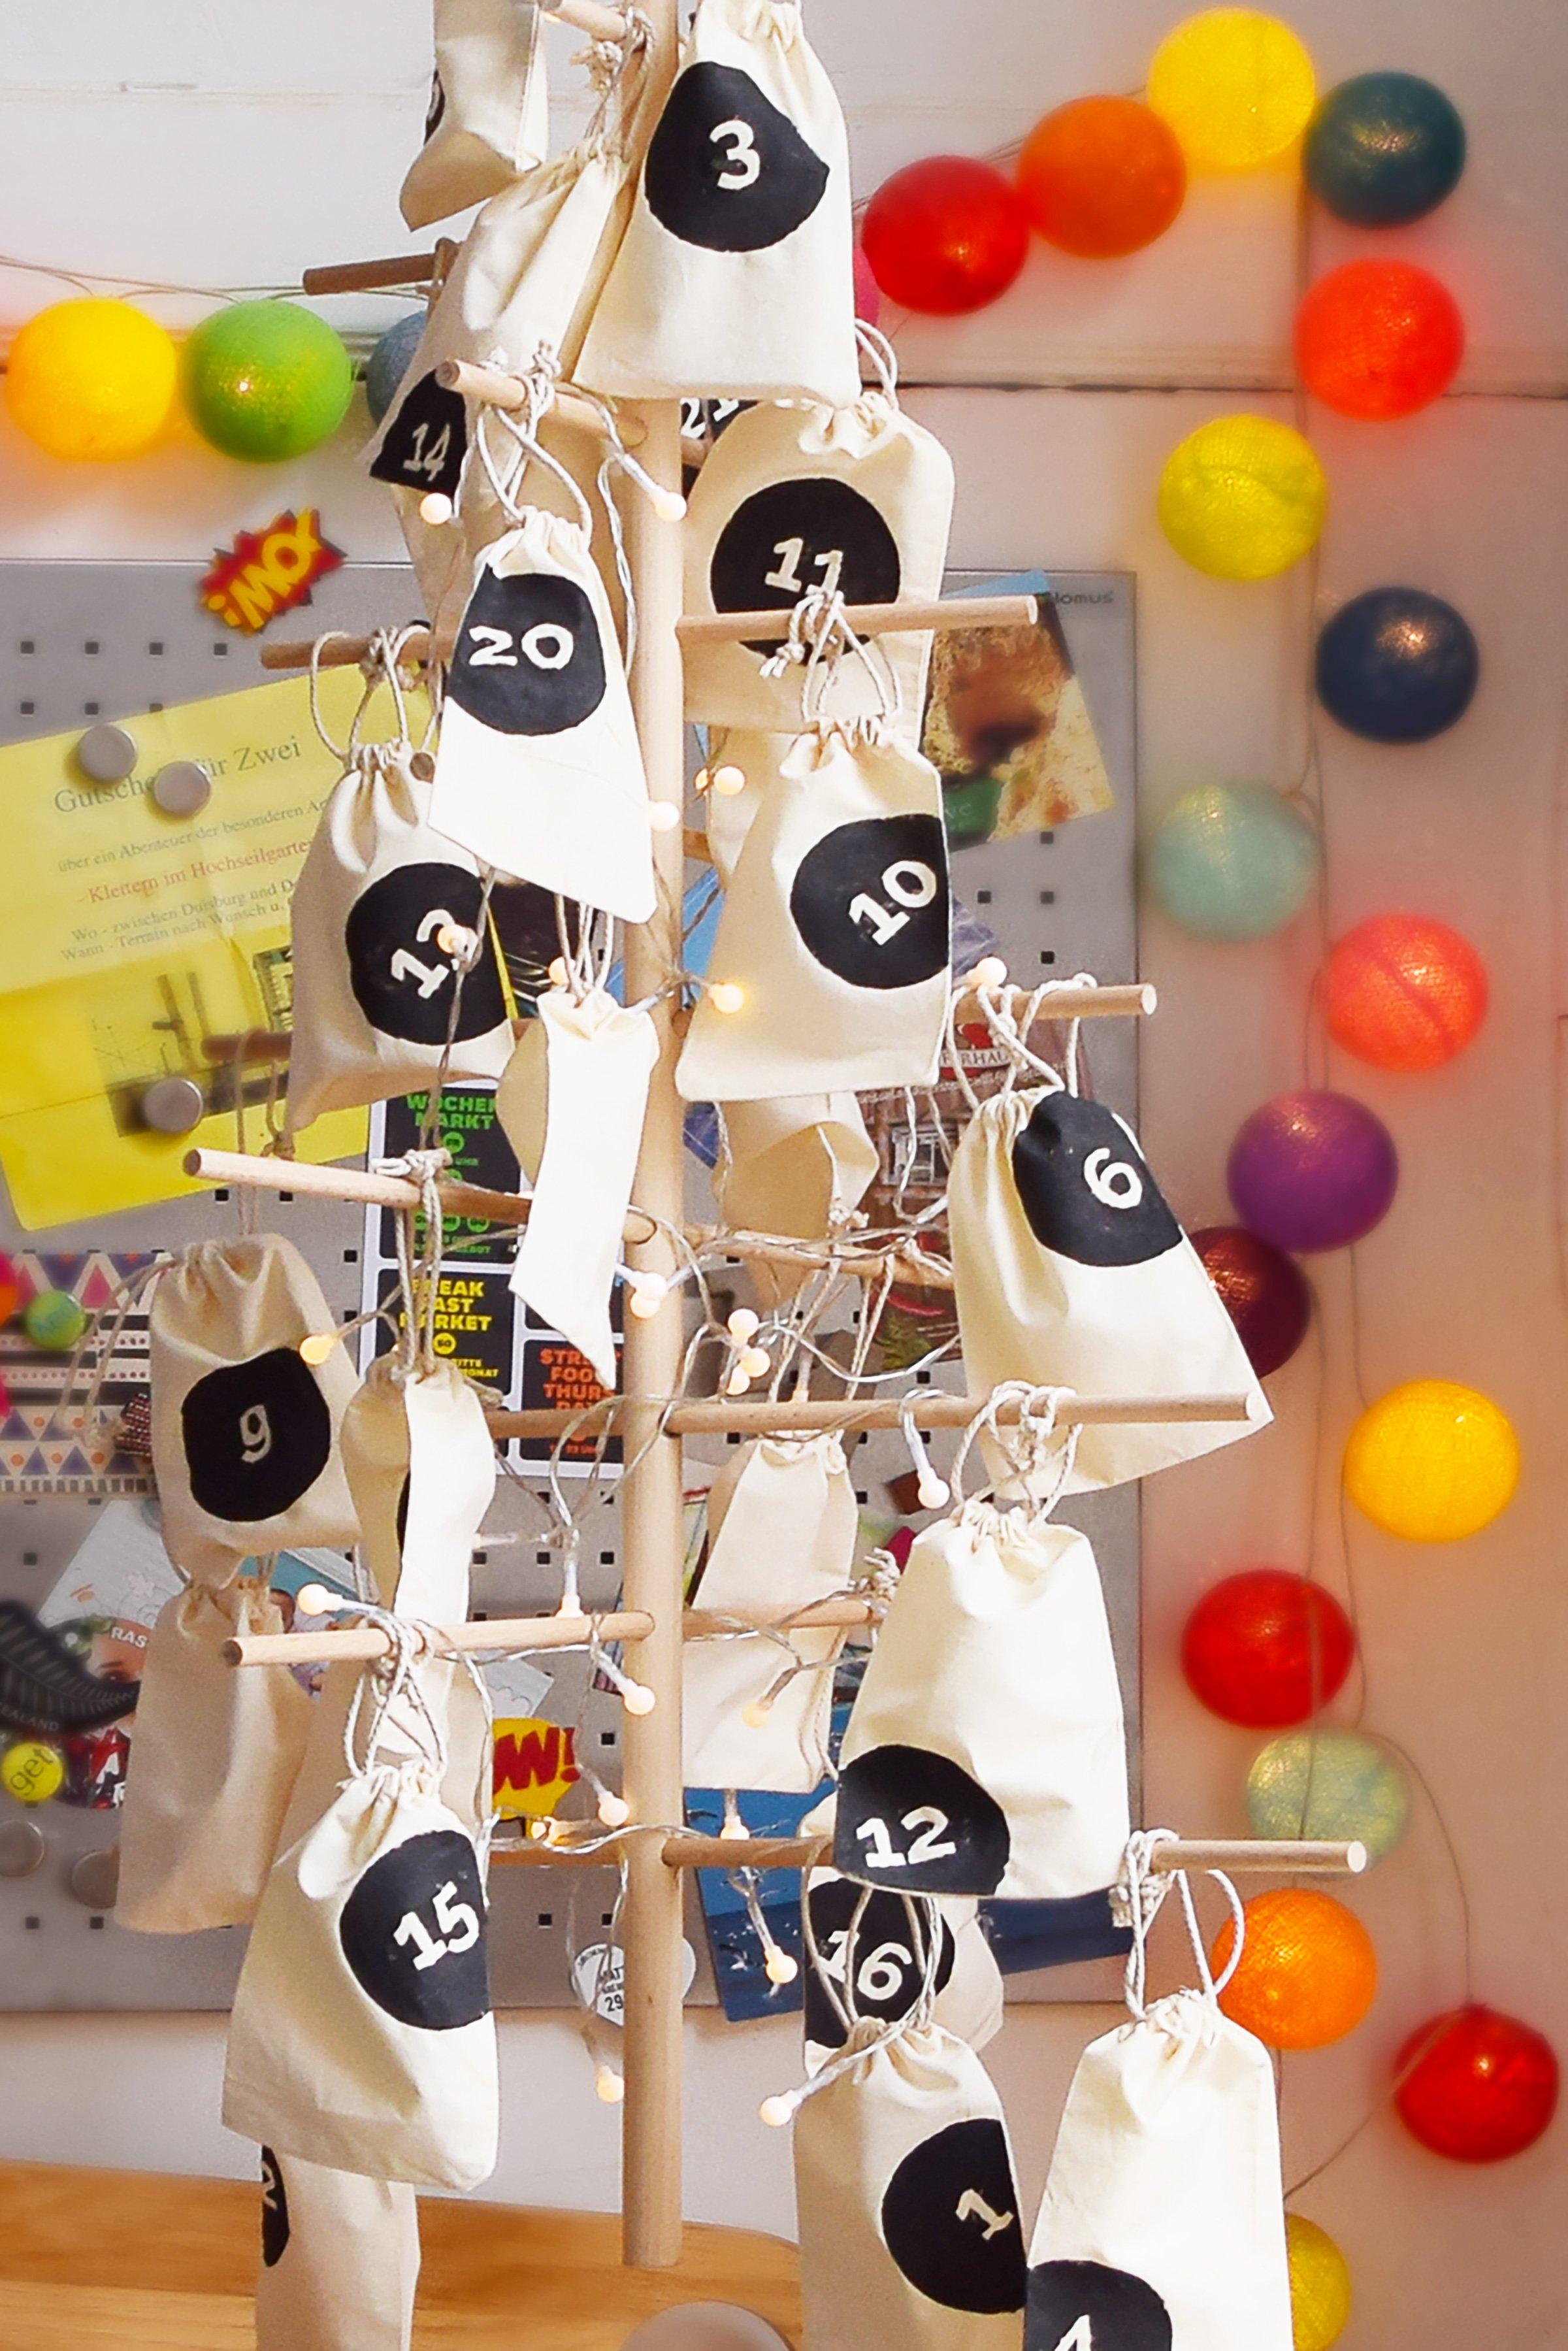 DIY Dowel Tree Advent Calendar | Little House On The Corner